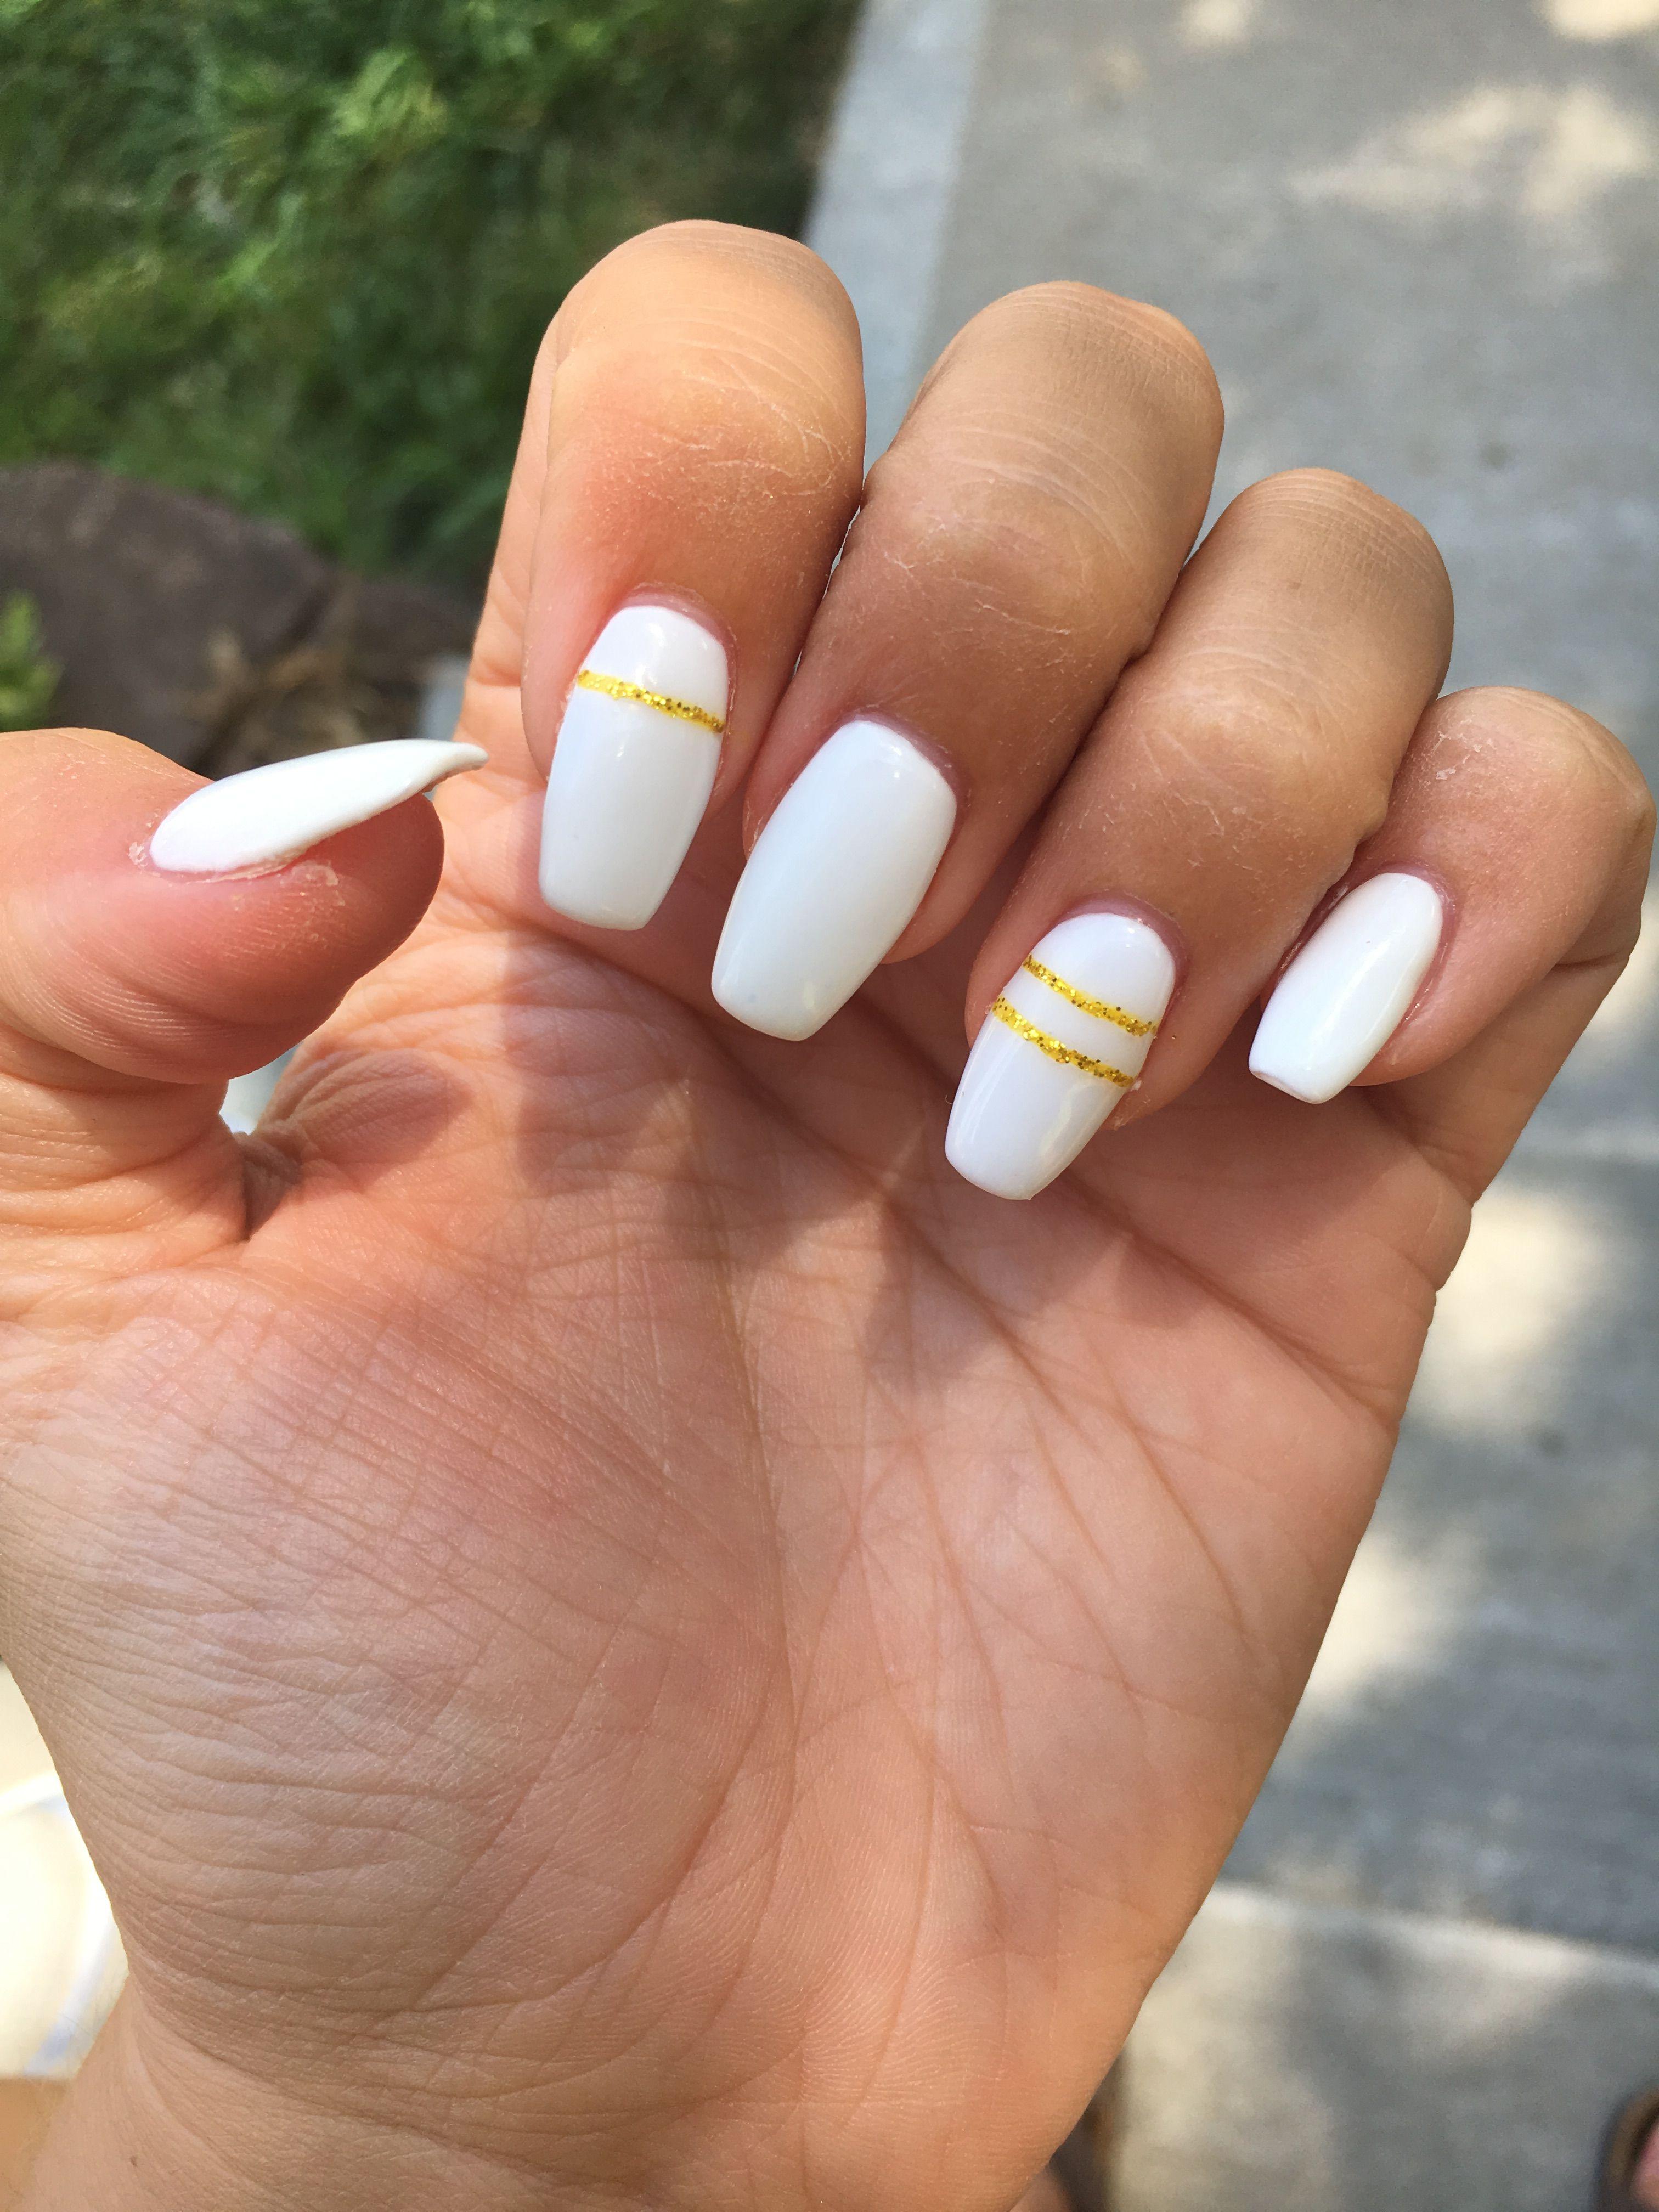 Acrylics Nails Design White Gold Glitter Glam Coffin